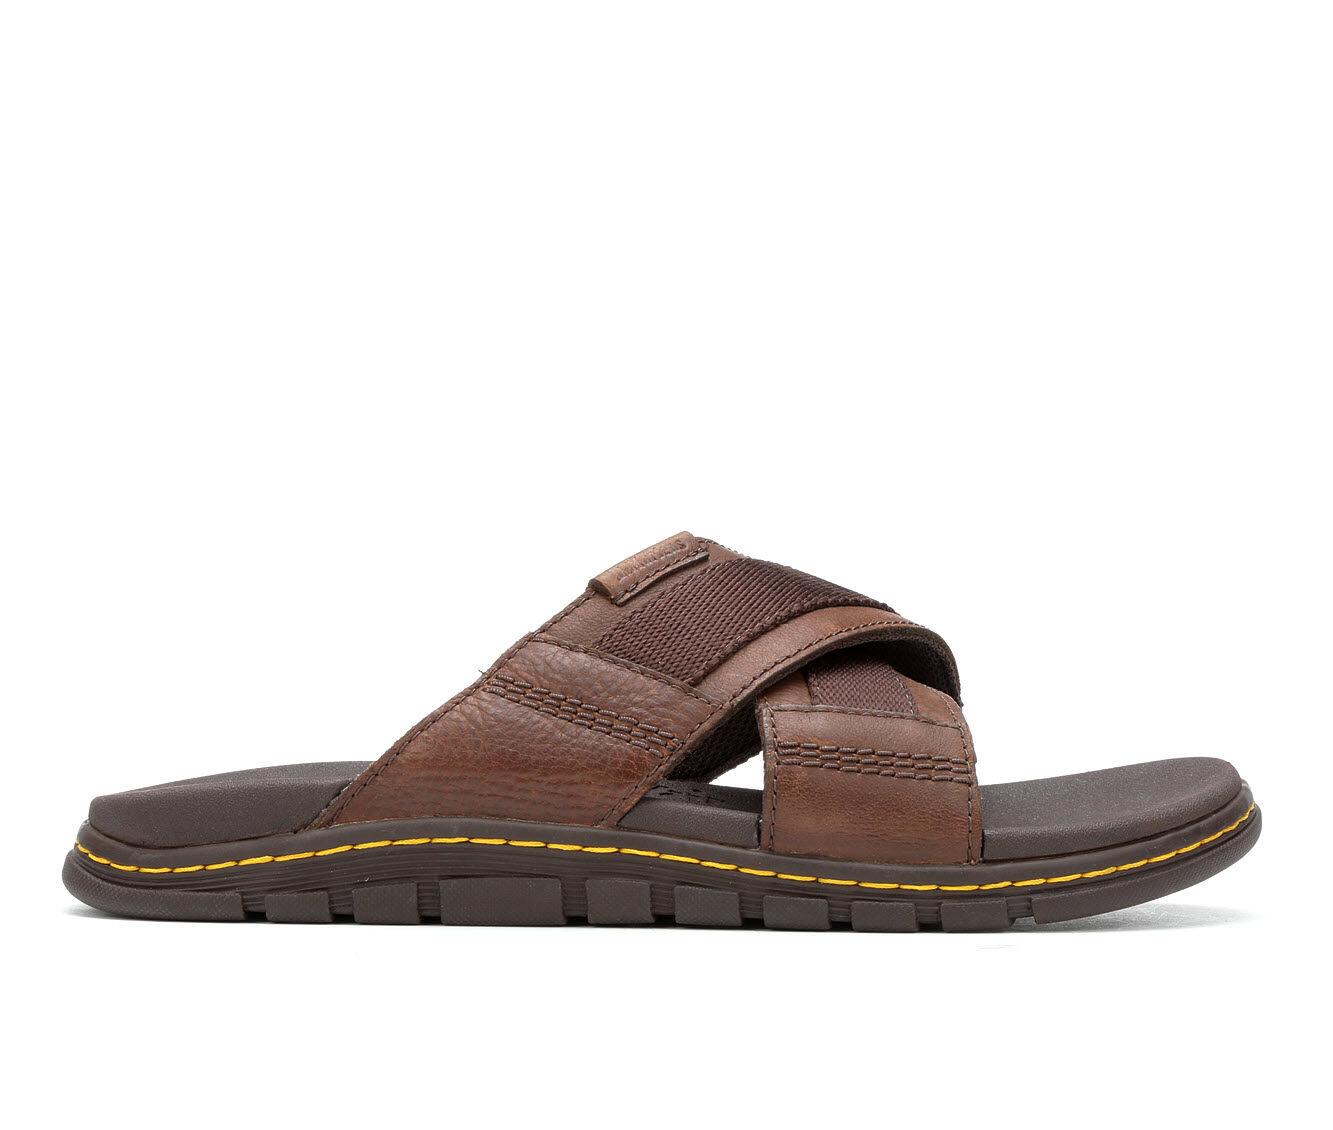 purchase latest Men's Dr. Martens Athens Slide Outdoor Sandals Tan/Dark Brown